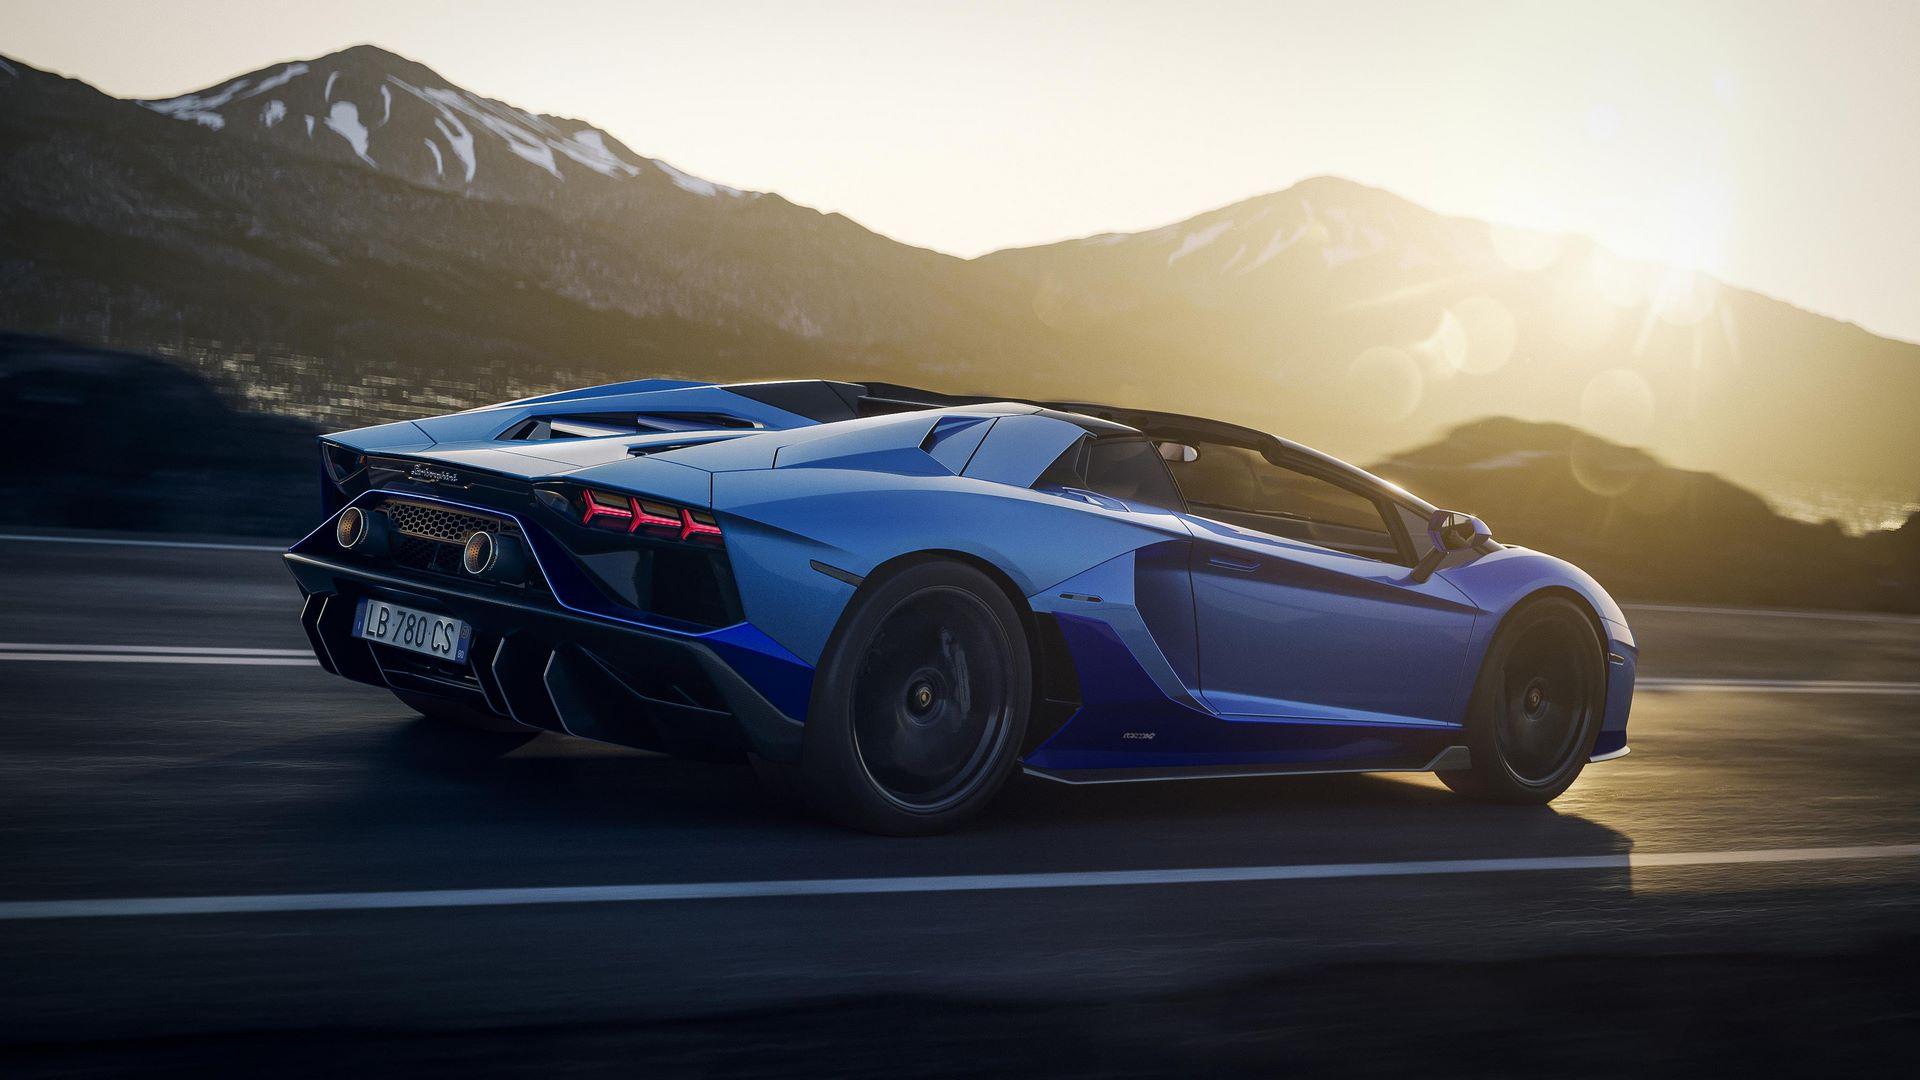 Lamborghini-Aventador-LP780-4-Ultimae-20